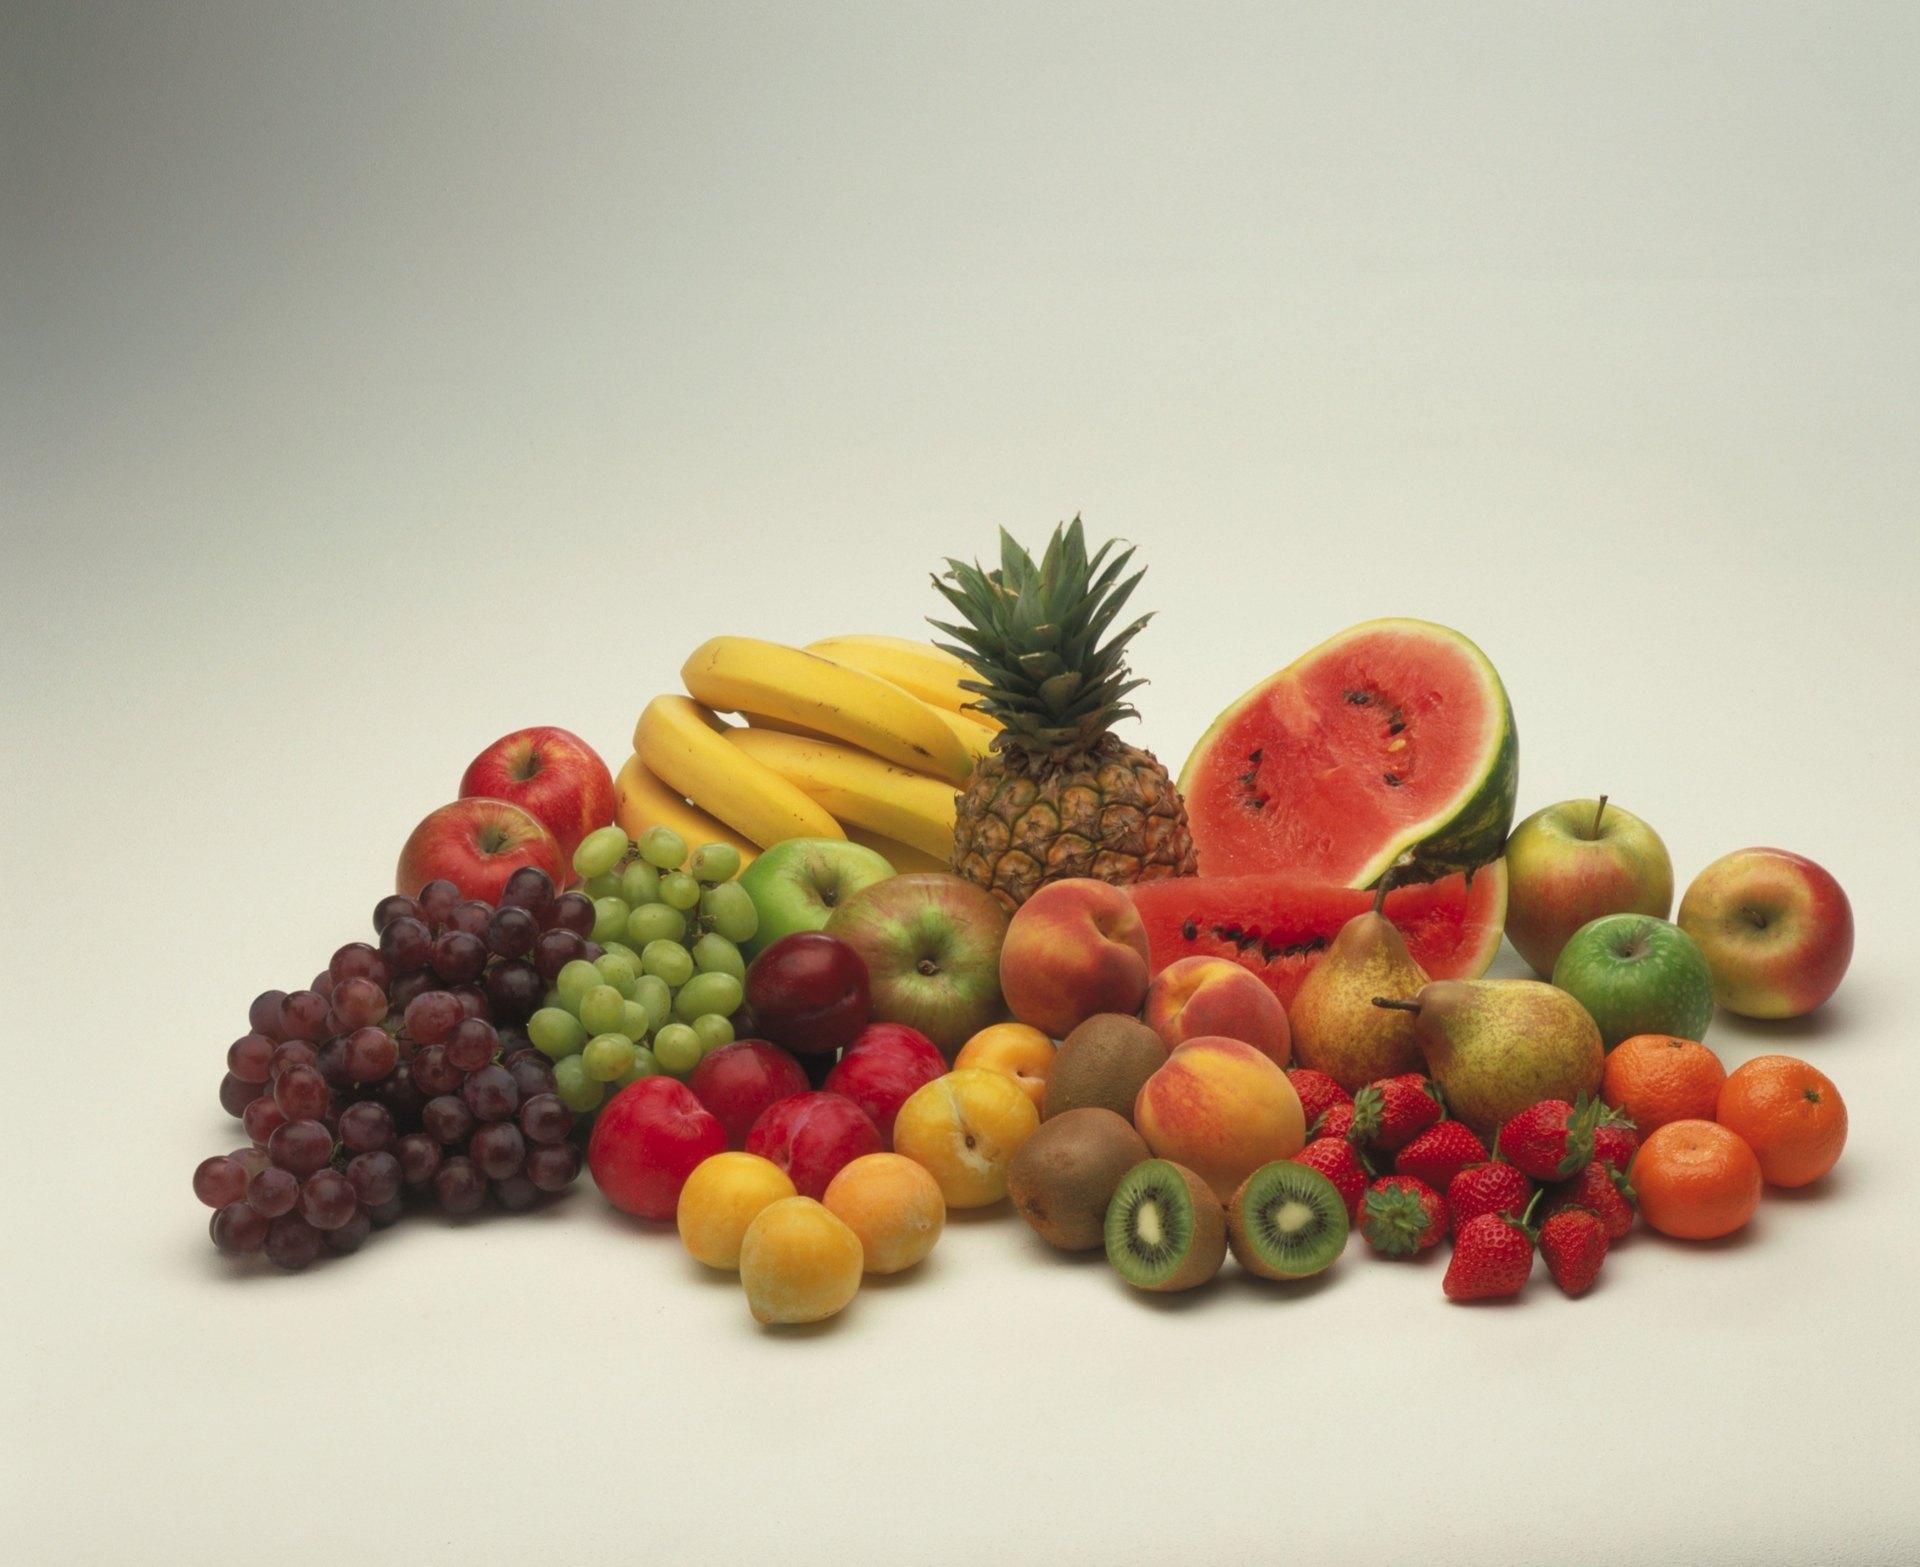 Olga Kabo does not adhere to diets and eats at night January 28, 2010